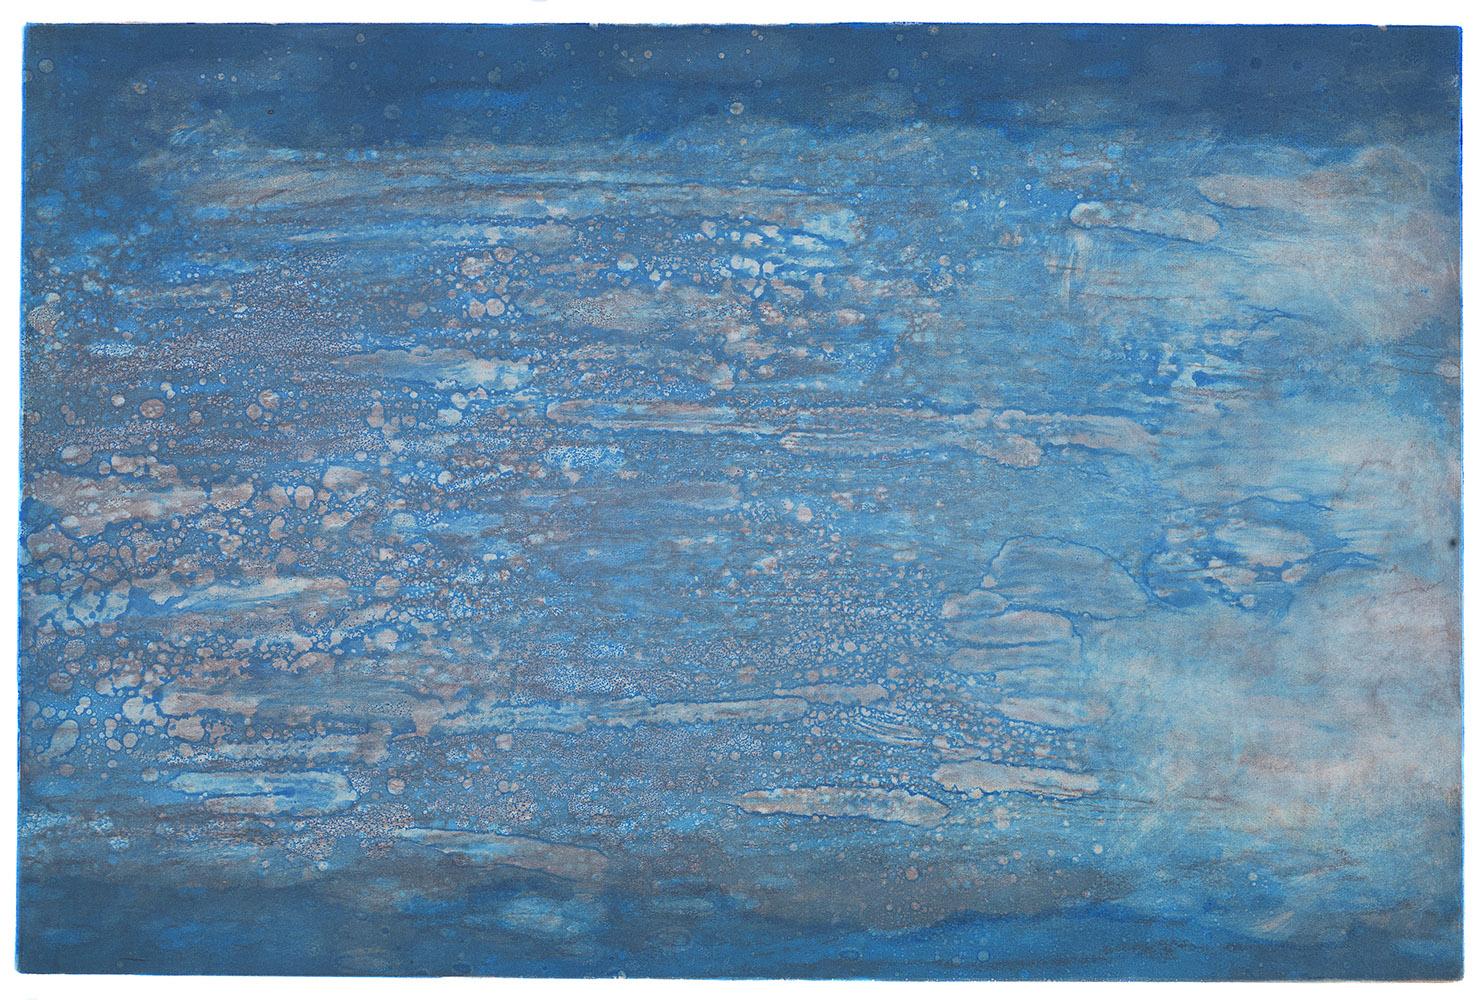 Blue Dazzle,Viscosity Monotype,24 x 16 in